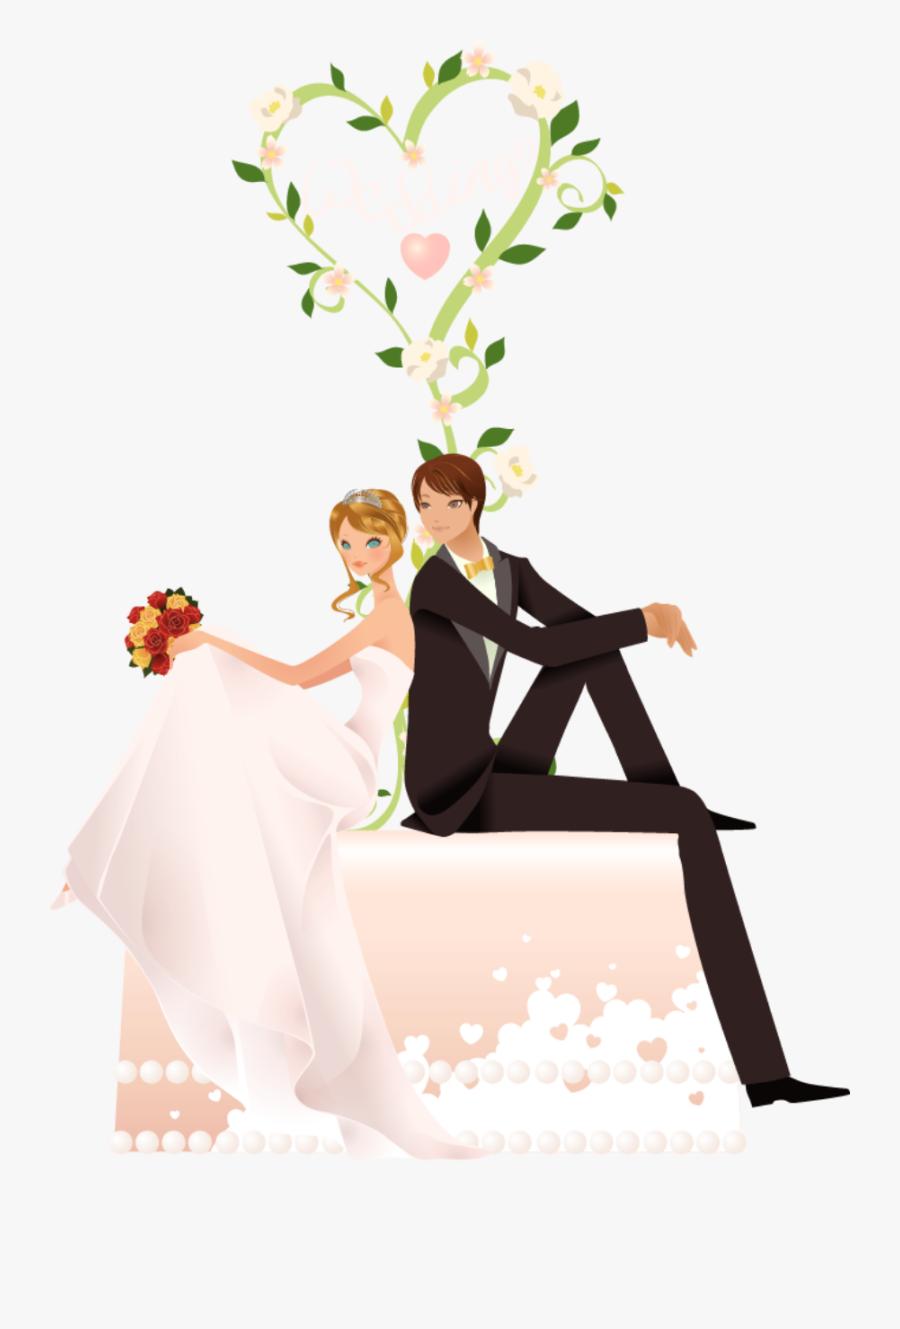 #wedding #couple #bride #love #feeling #feels #sitting - Wish U Happy Marriage Life, Transparent Clipart